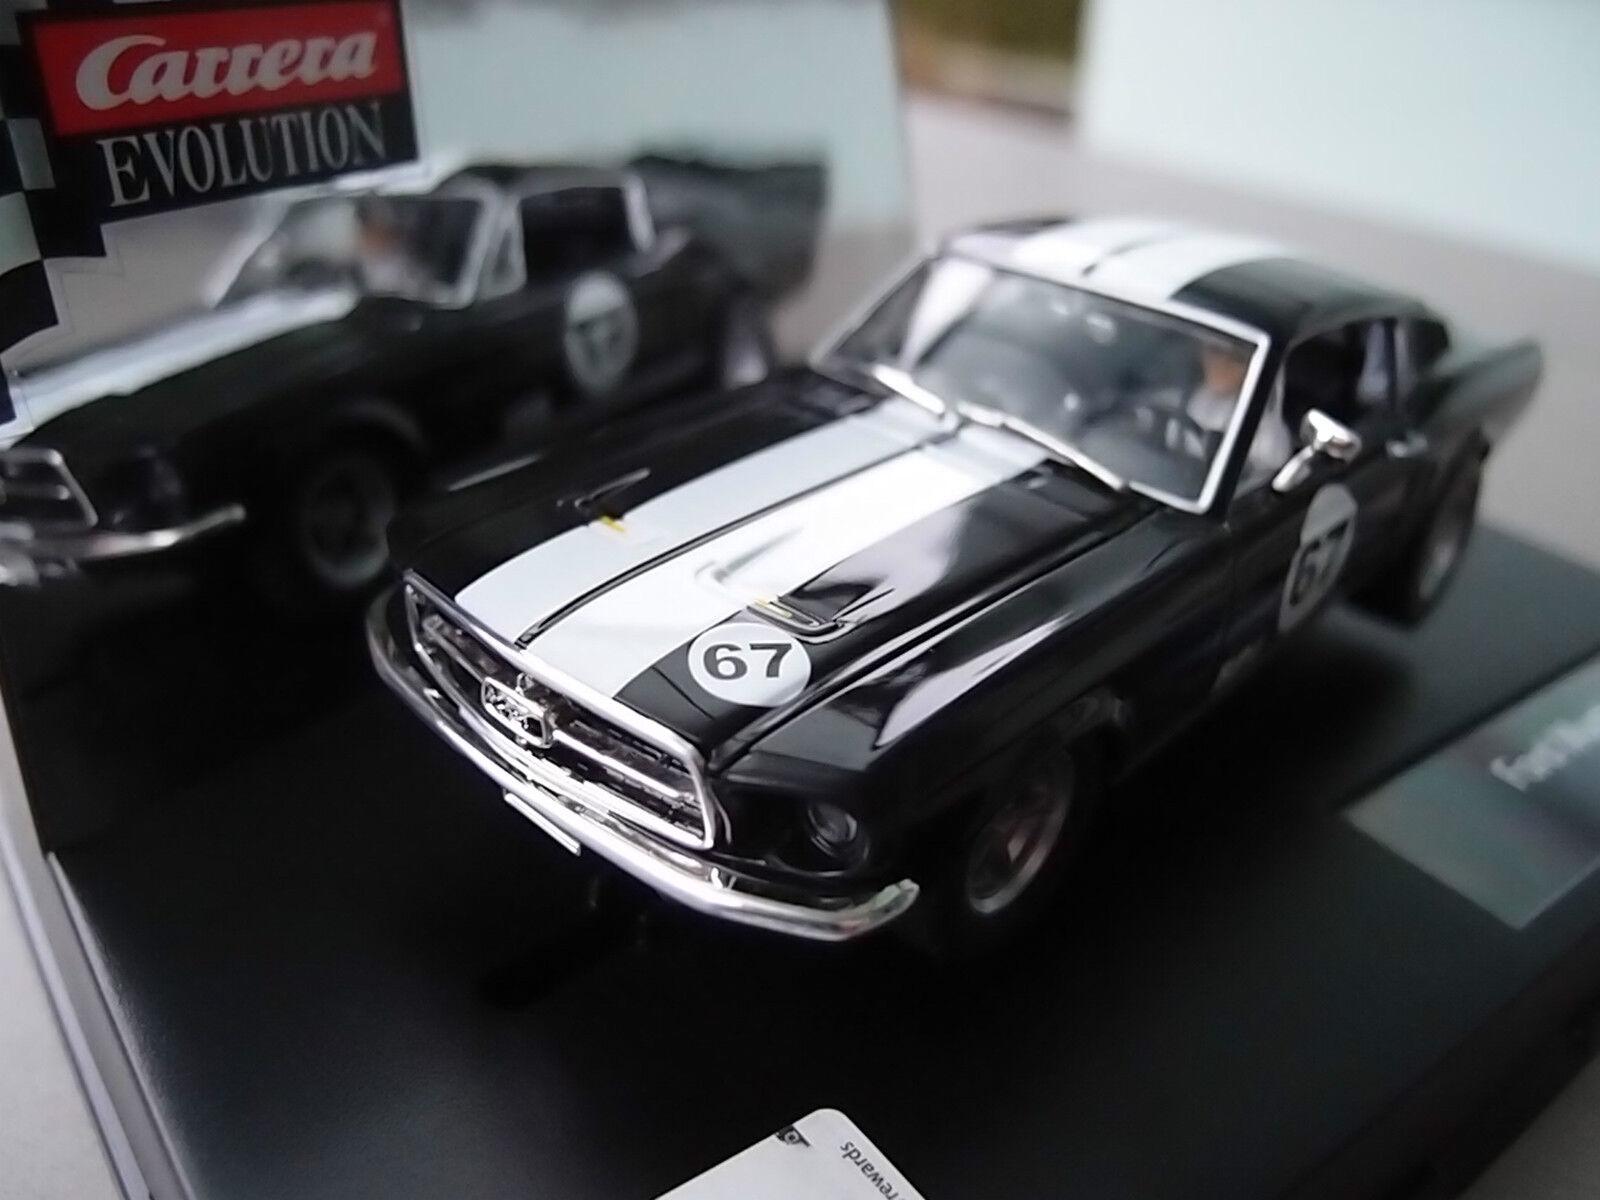 Carrera Evolution 27451 Ford Mustang GT   no. 67   NIP